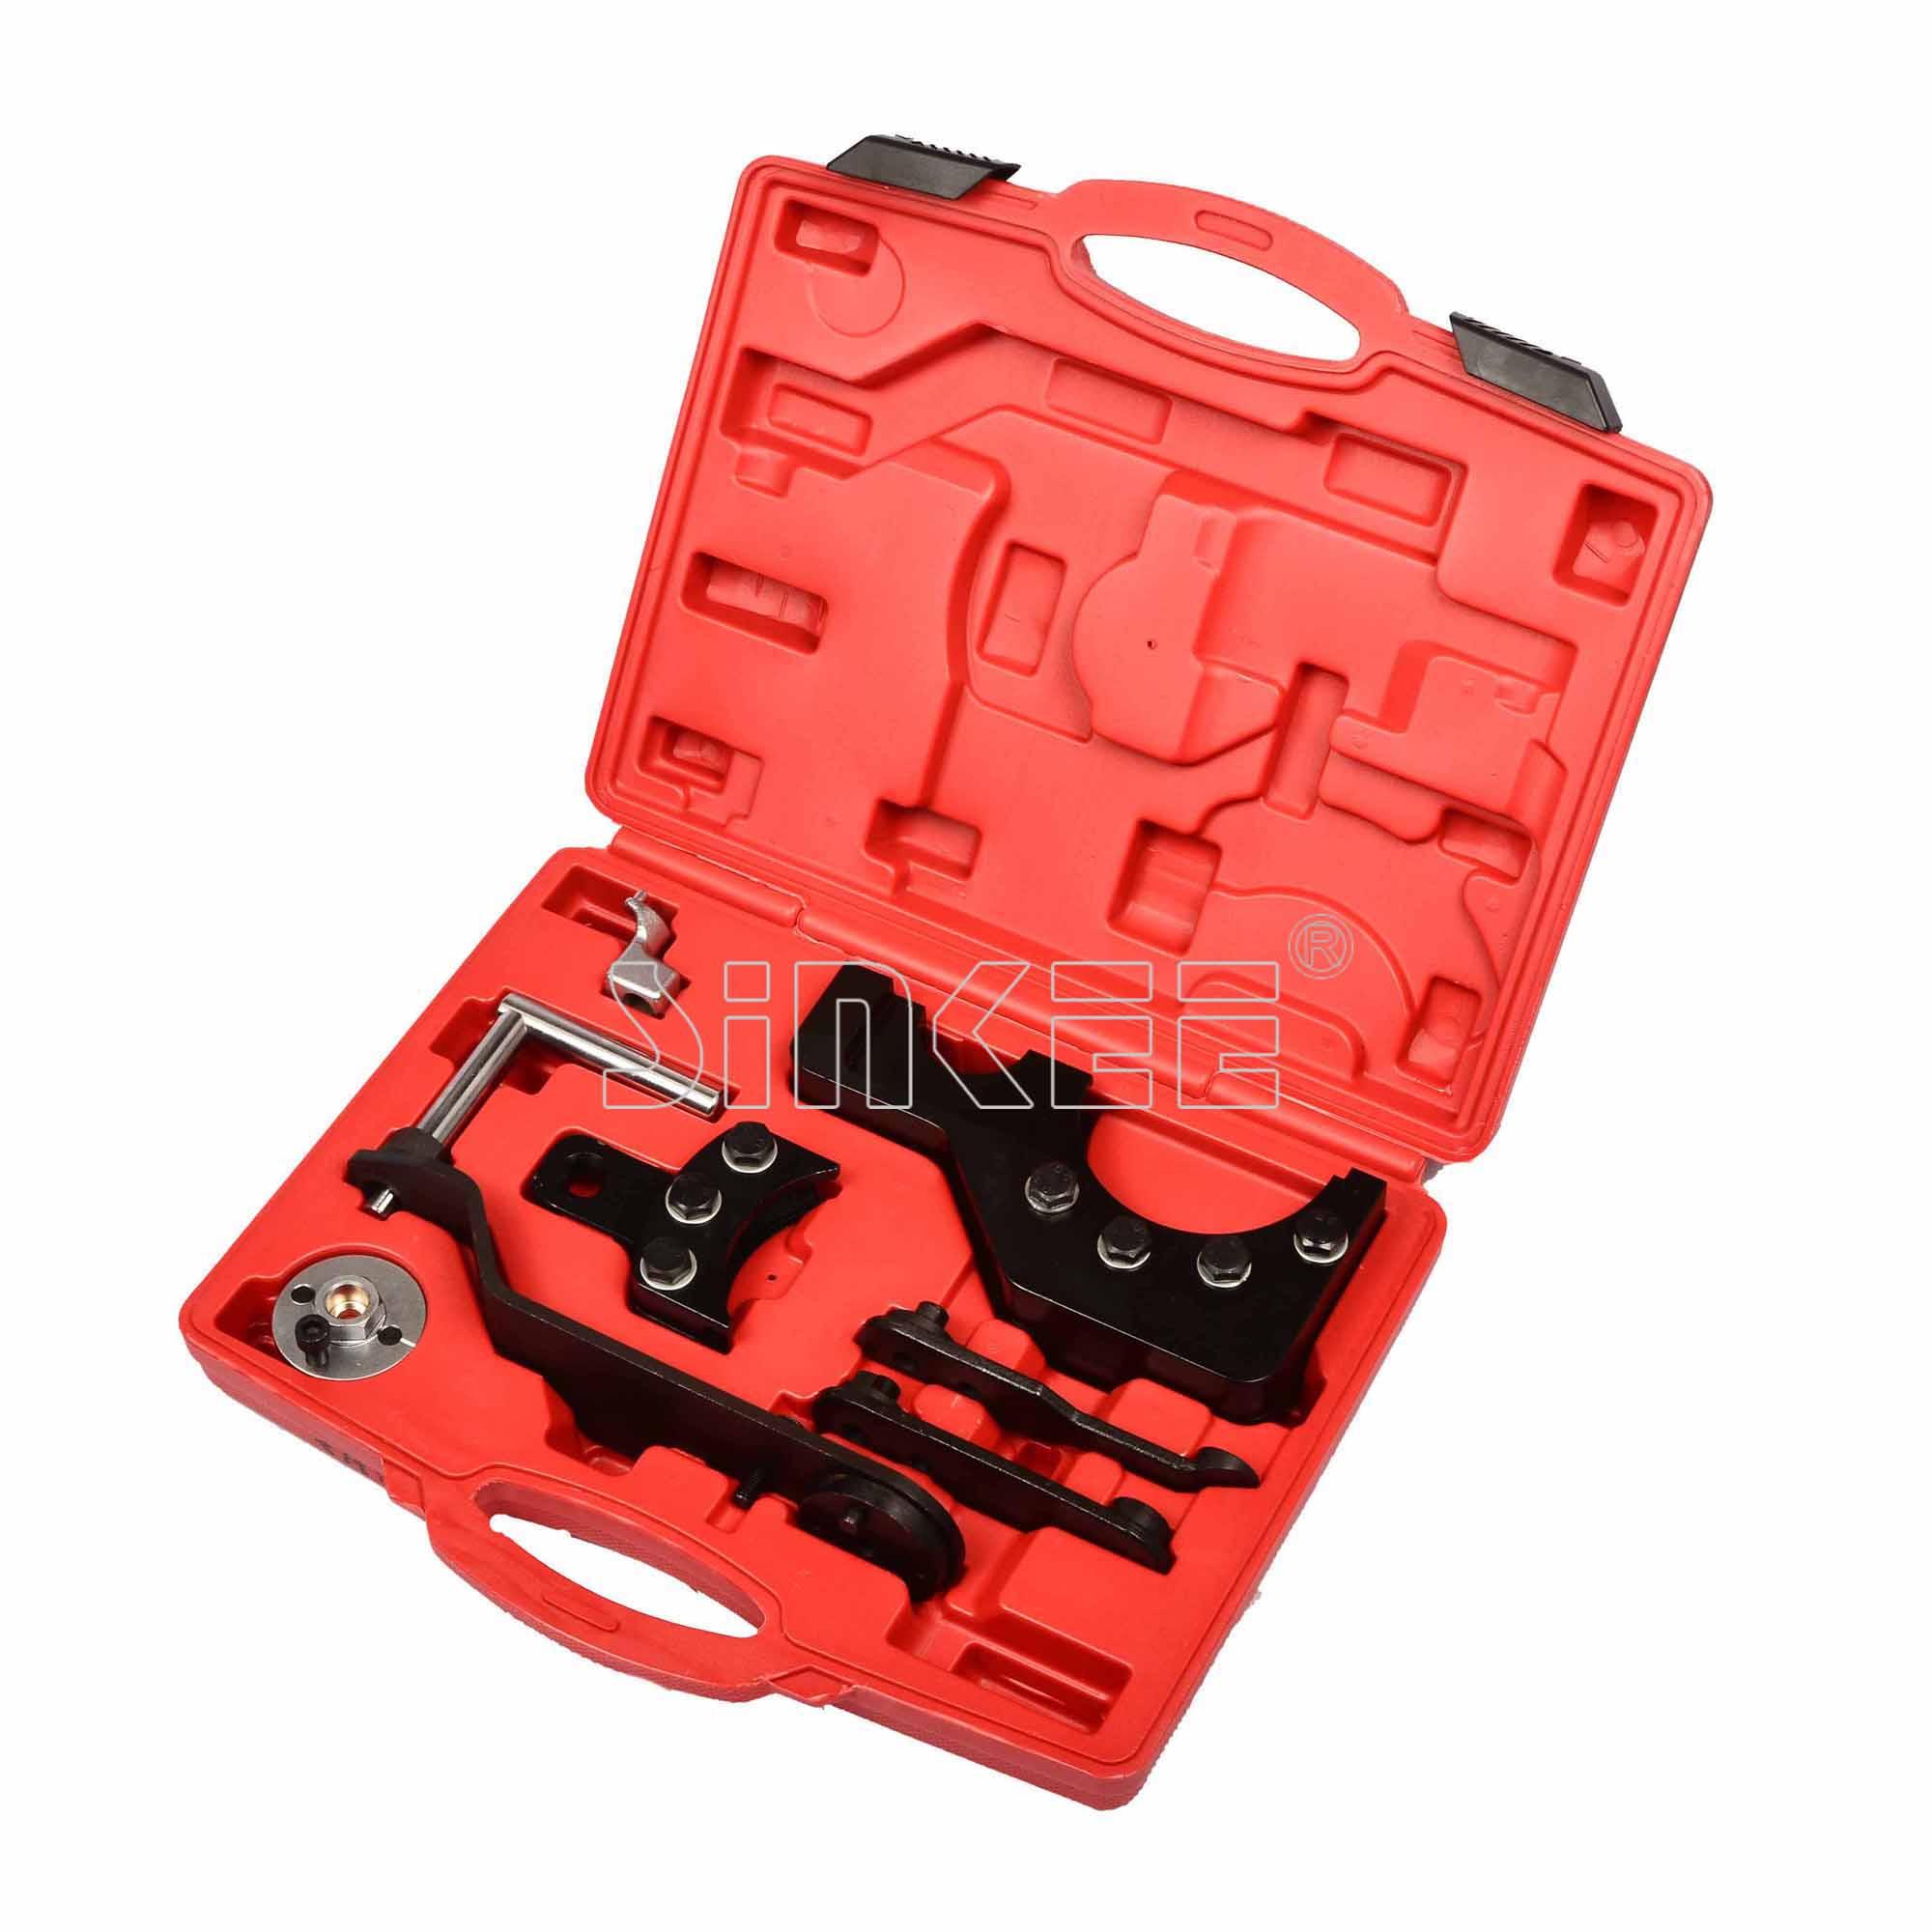 Para VW VAG Ferramenta de Sincronismo Do Motor Para Touareg Phaeton 2.5 TDI 4.9 PD Diesel 5 10 Kit Cilindro SK1212